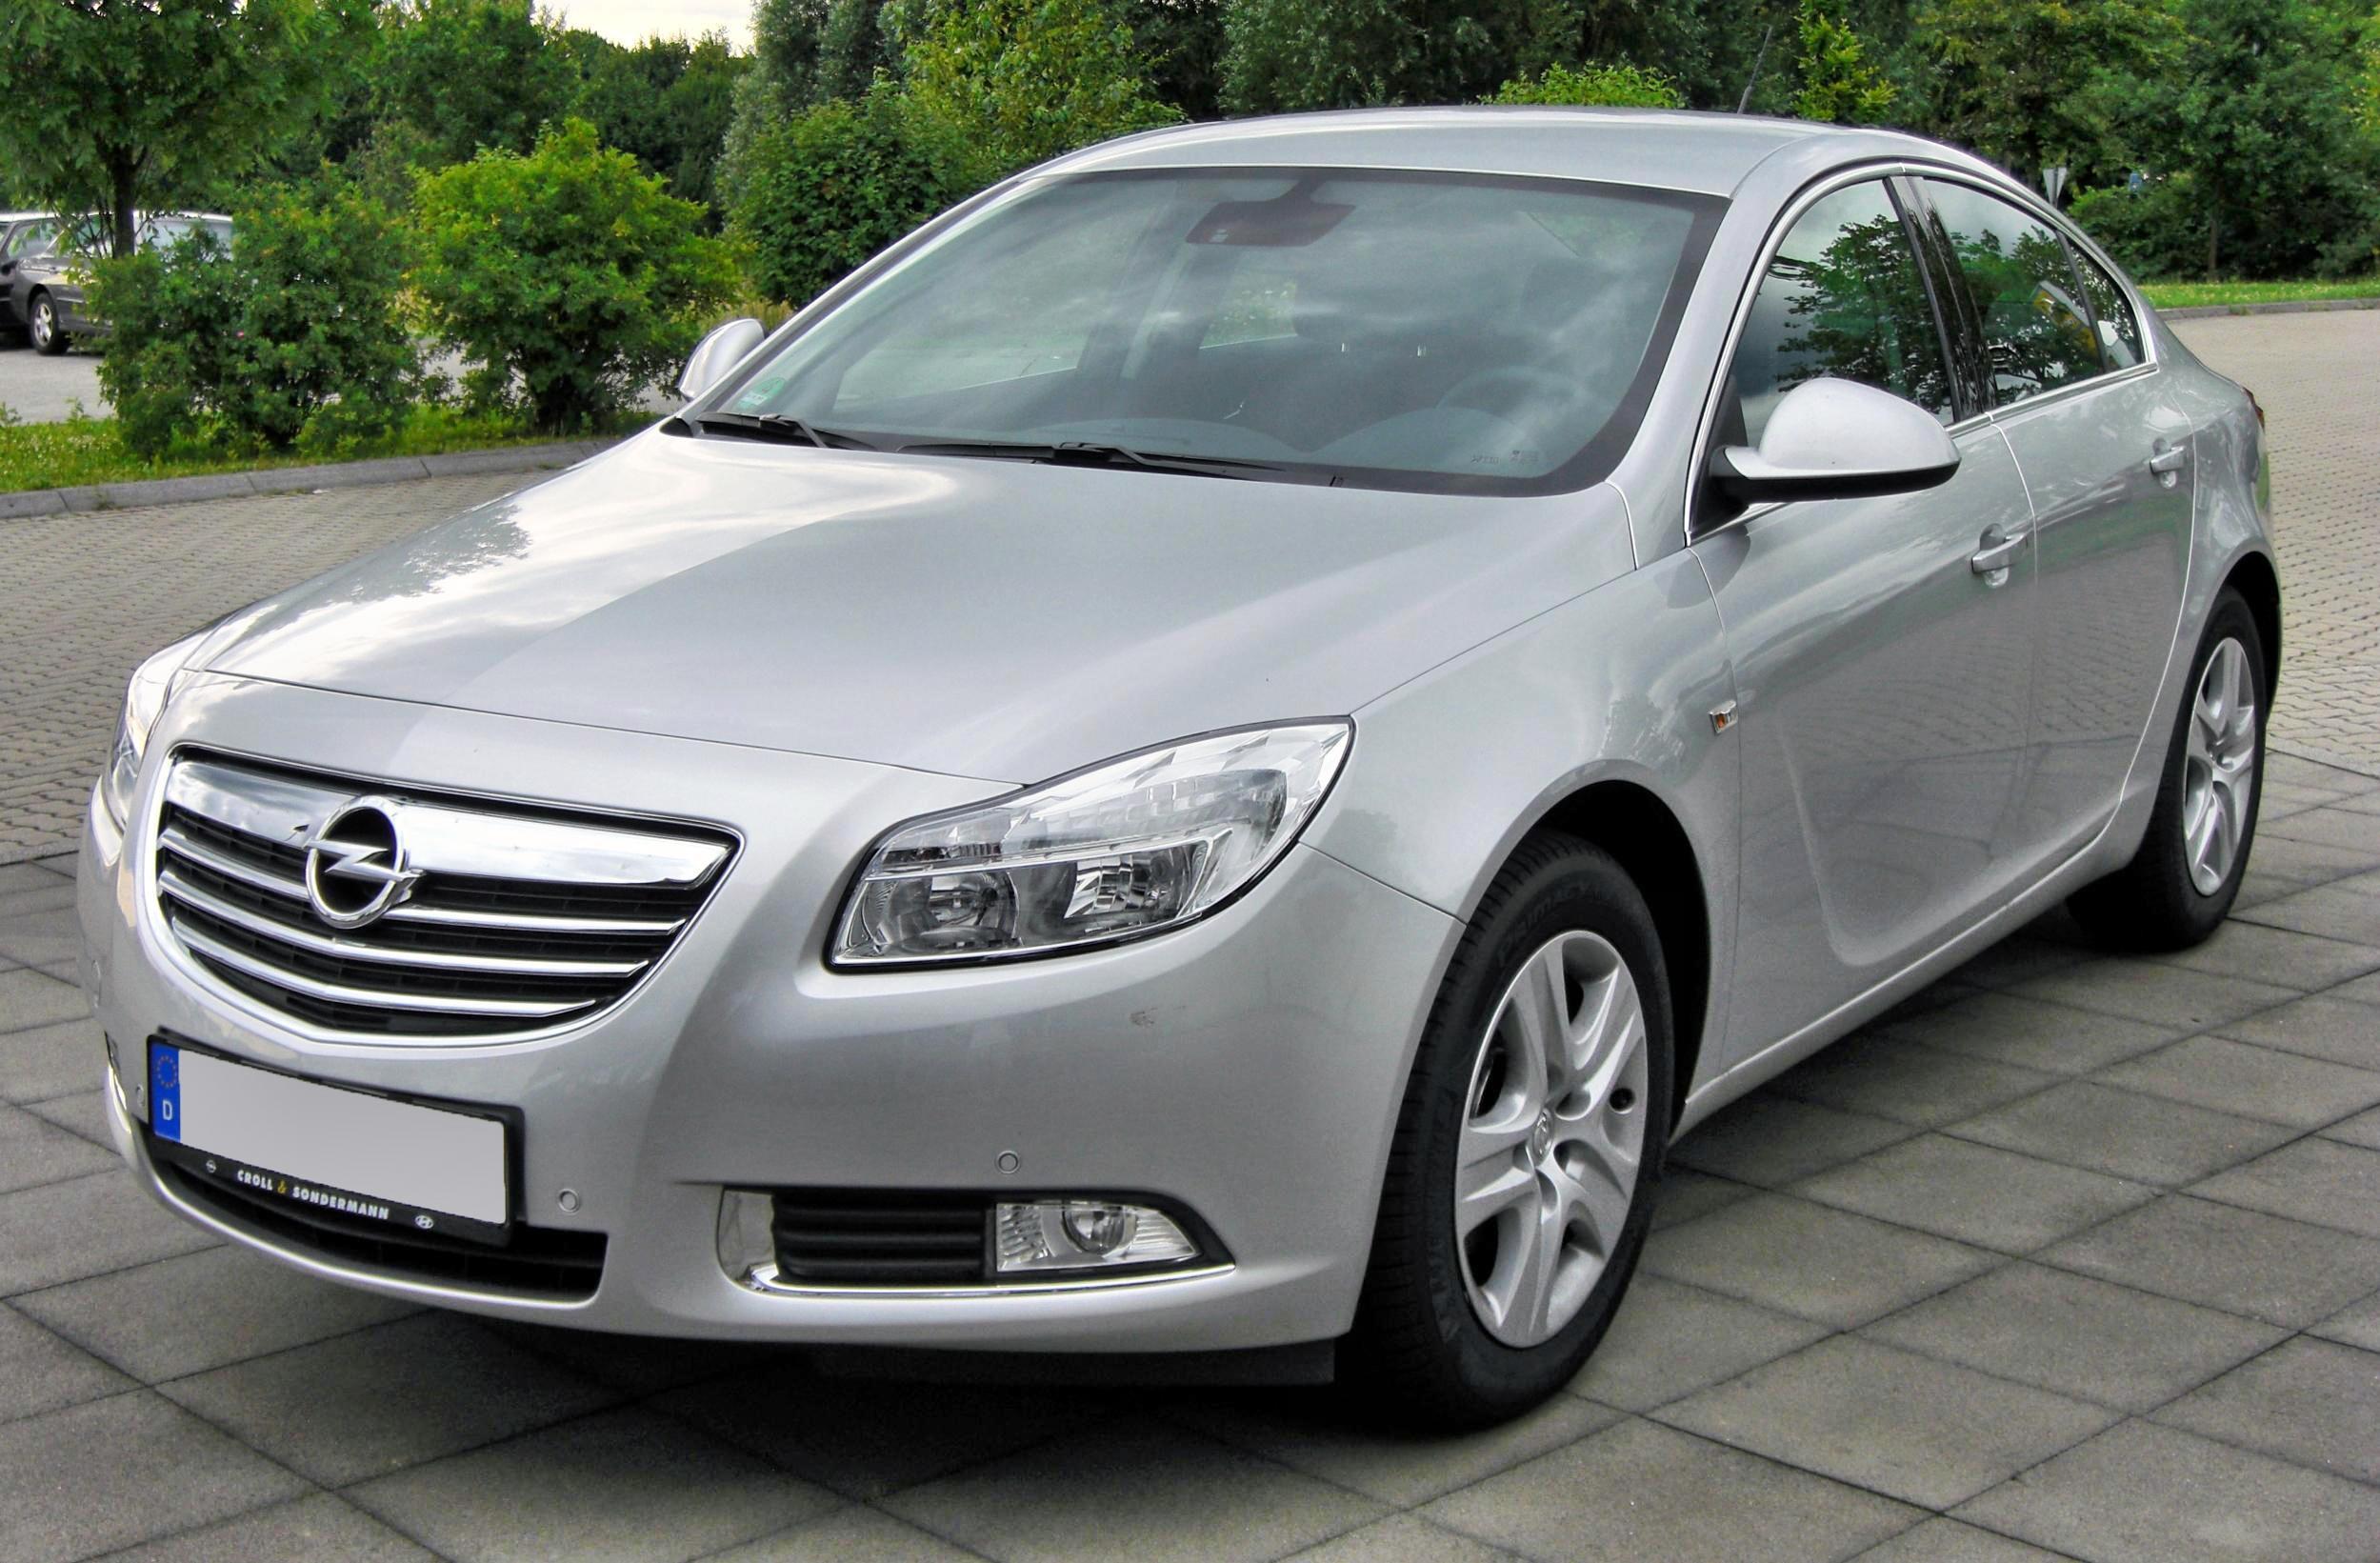 Opel Insignia Wiki >> File:Opel Insignia 20090717 front.jpg - Wikimedia Commons